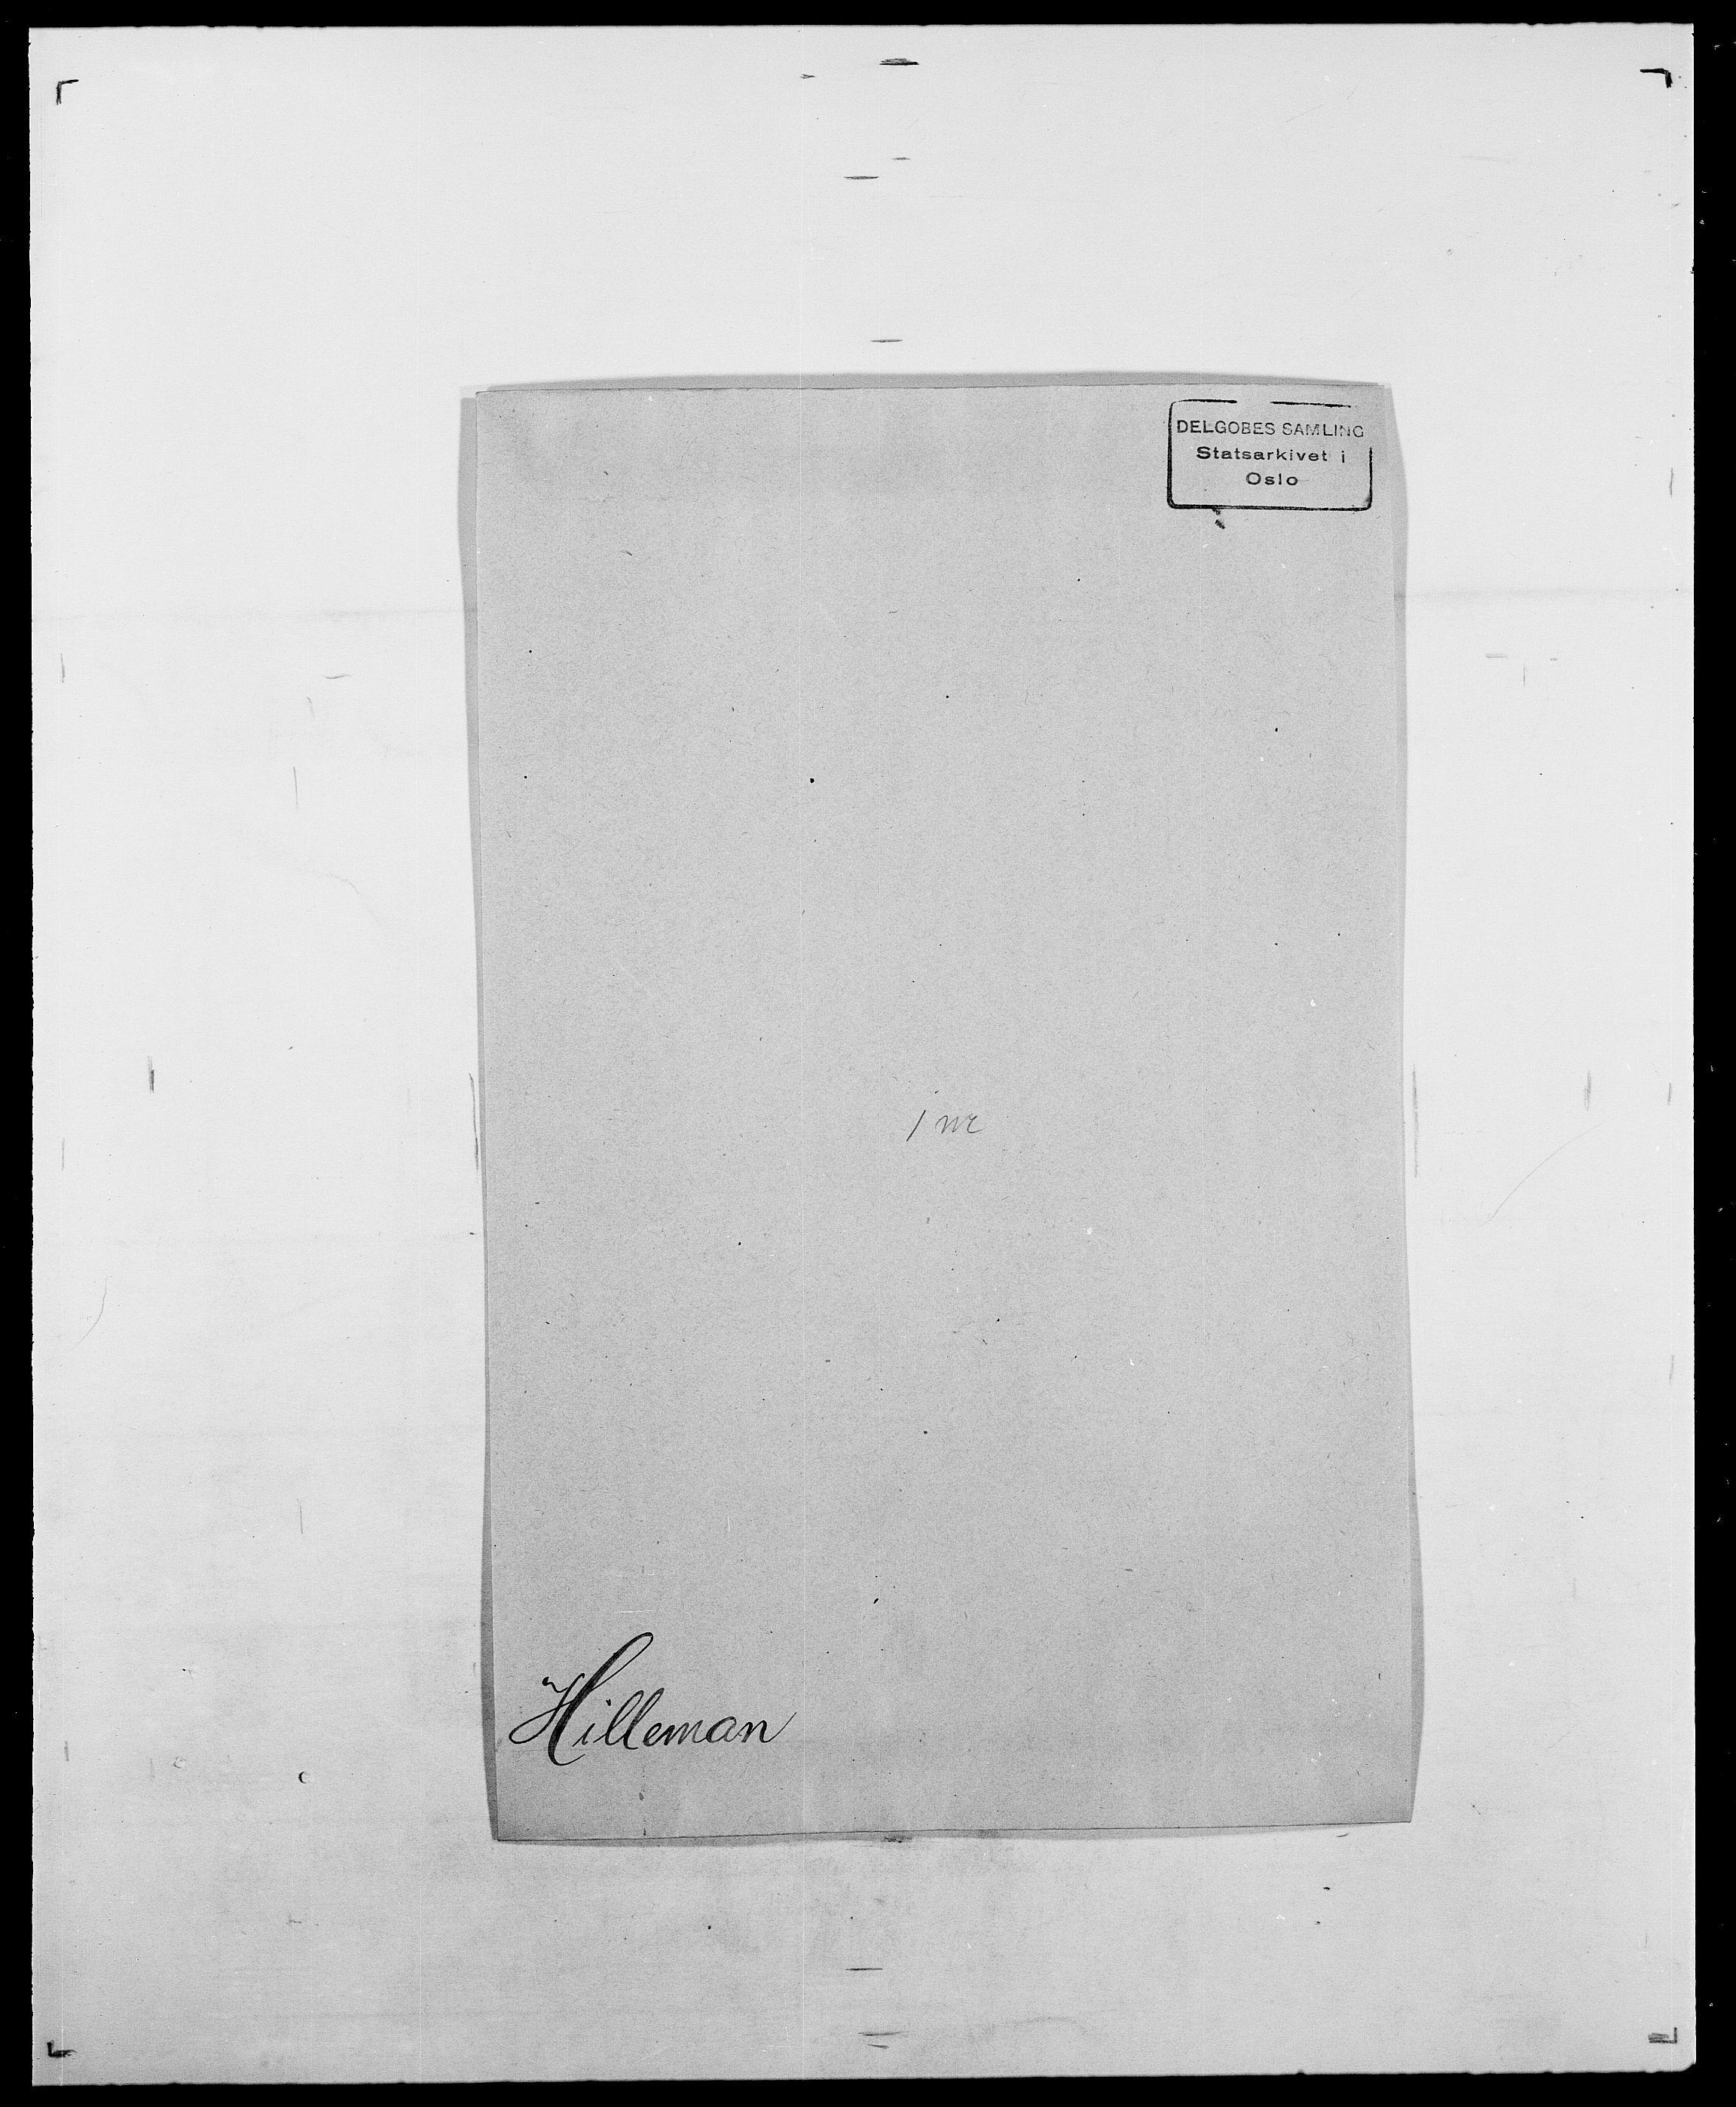 SAO, Delgobe, Charles Antoine - samling, D/Da/L0017: Helander - Hjørne, s. 438